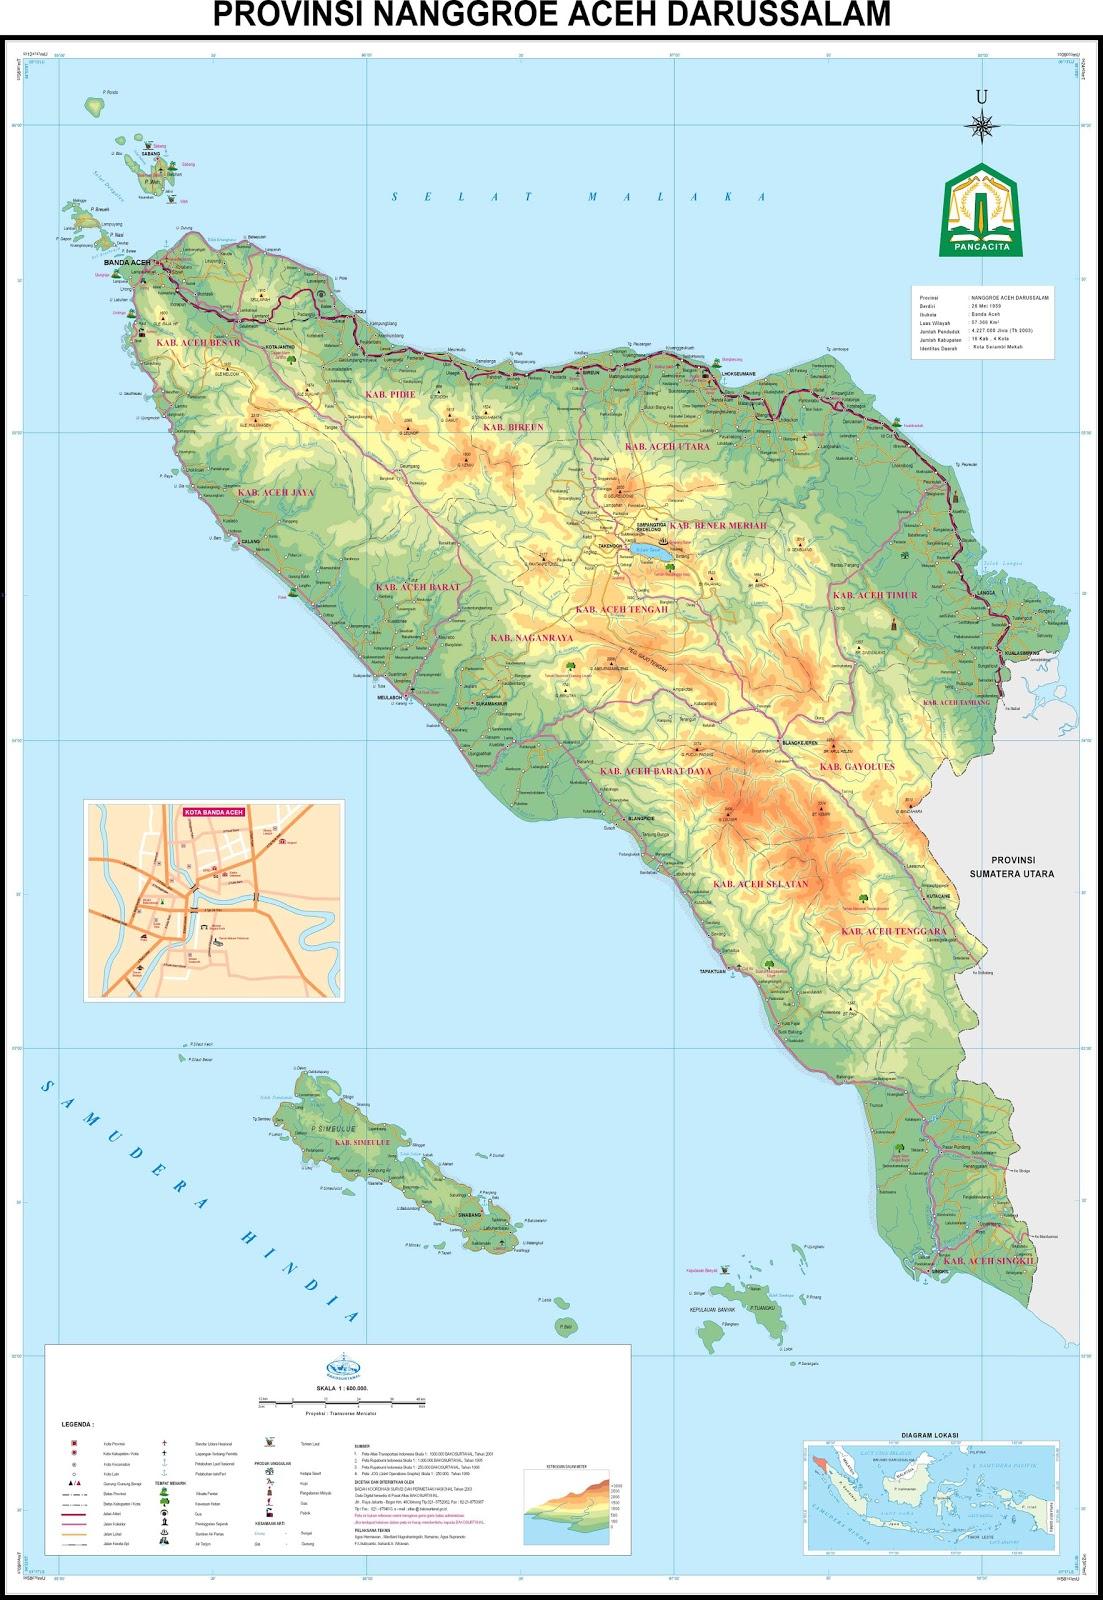 Harun Ar Mg Sakti Palembang Peta Provinsi Nangroe Aceh Darussalam